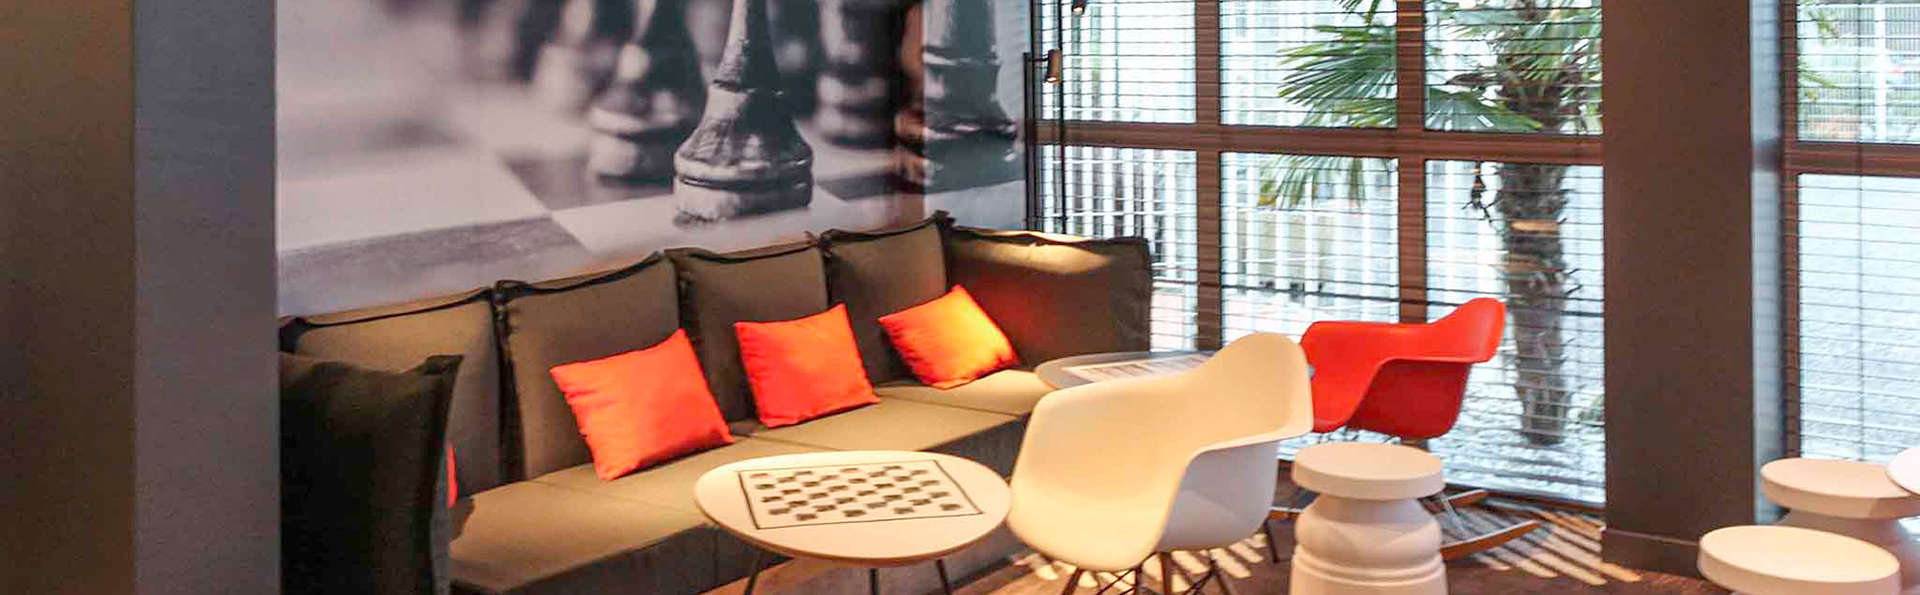 Hotel Ibis Bordeaux Sud Pessac - Edit_Lounge.jpg